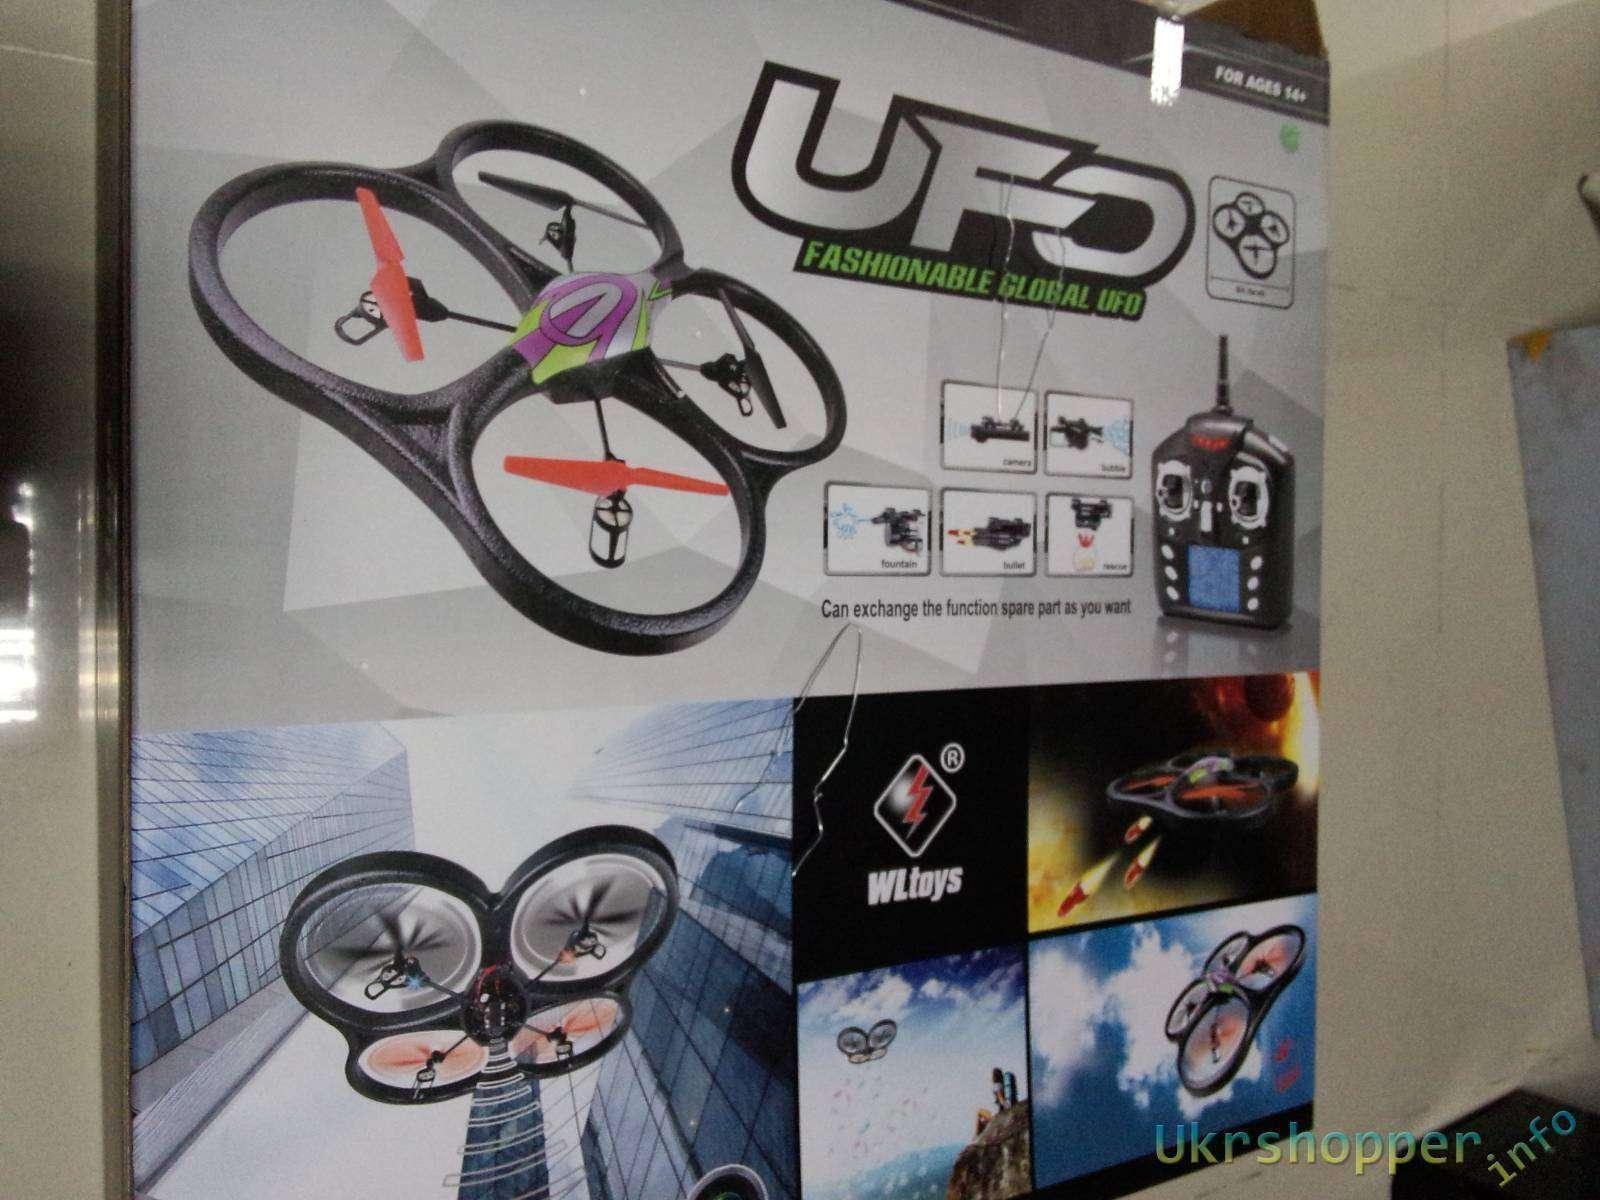 GearBest: Небольшой обзор квадракоптера UFO WLtoys V262 Cyclone 2.4GHz 4 канала